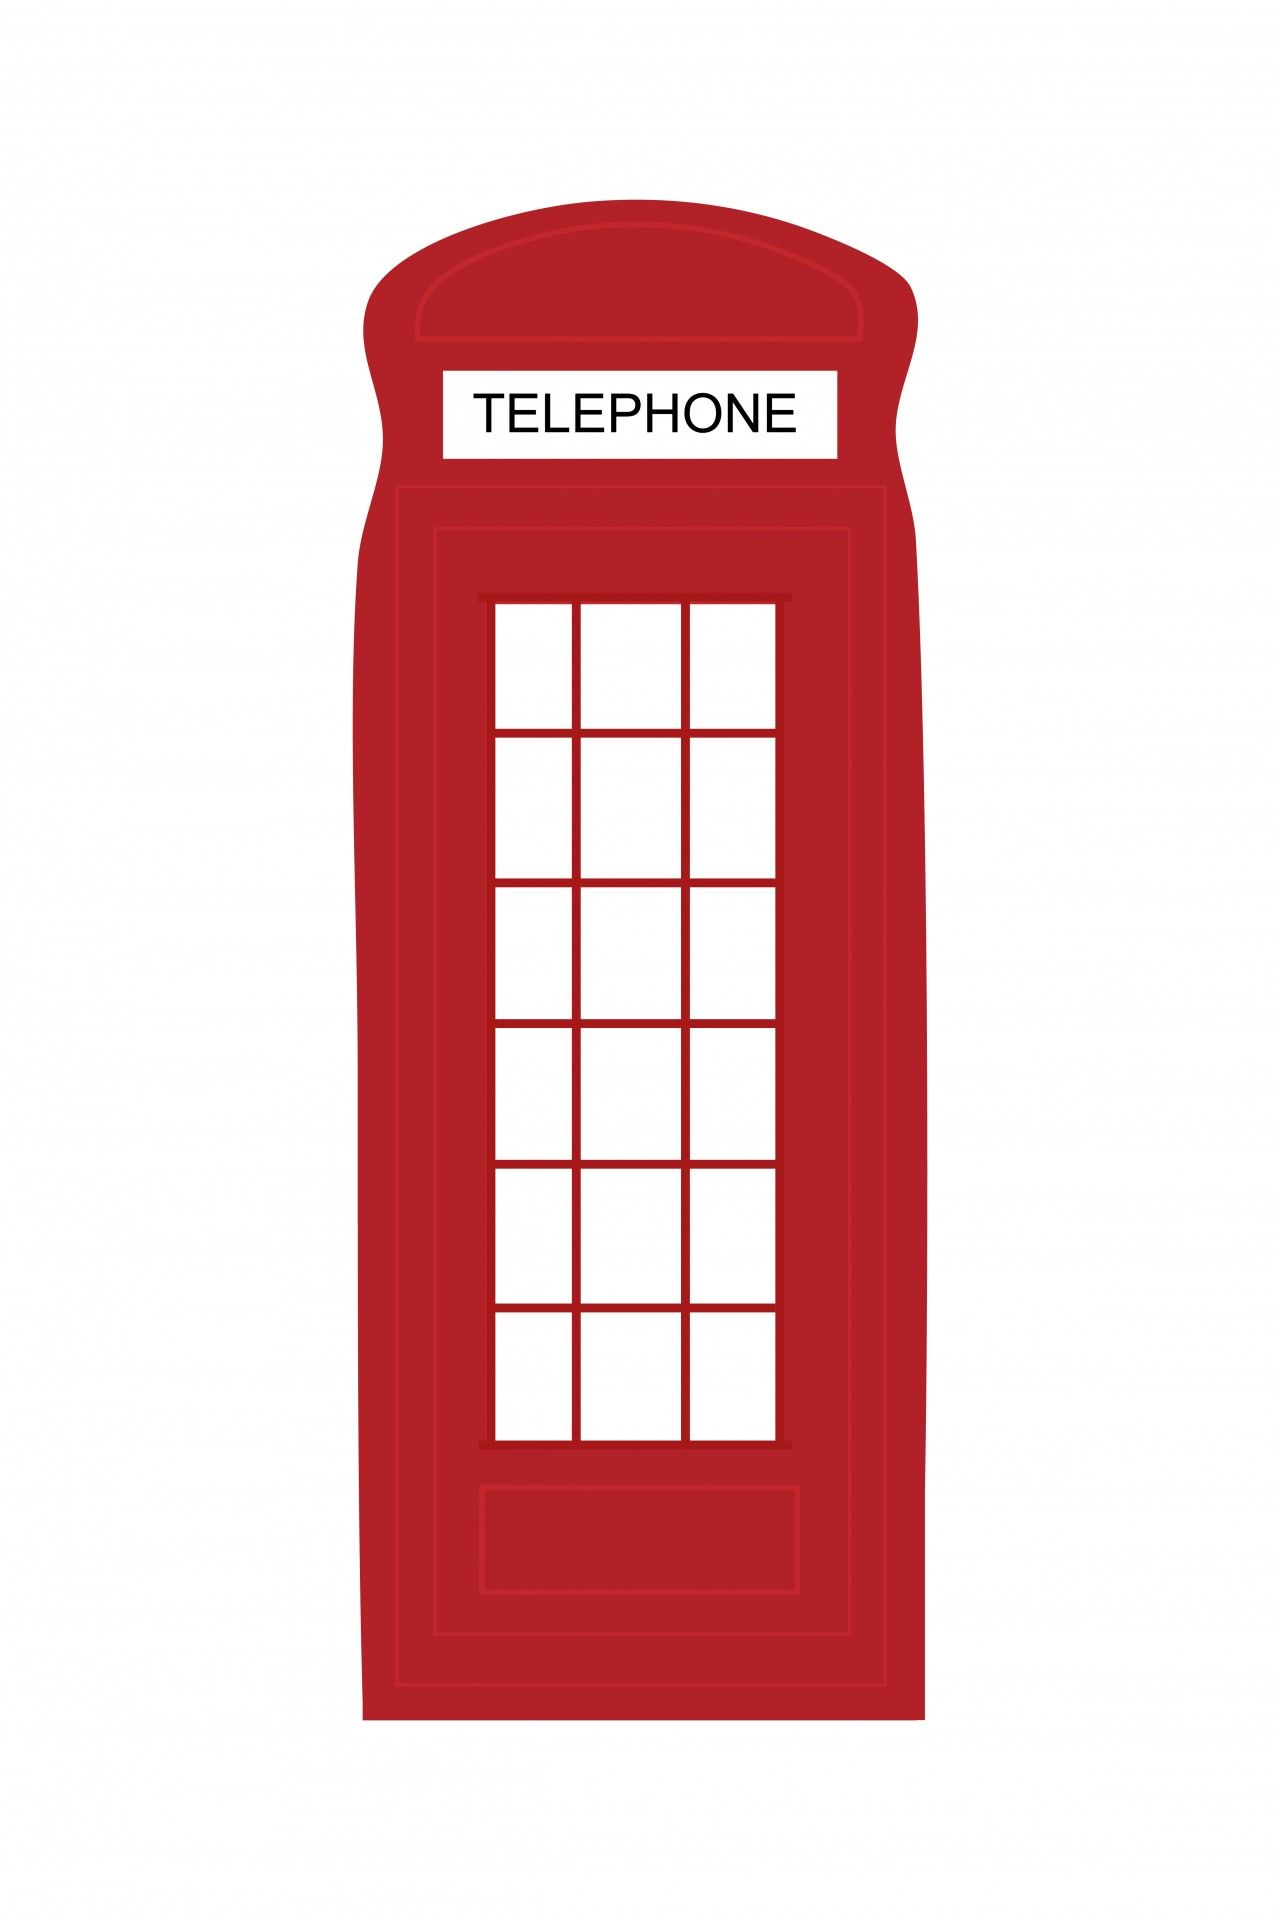 London Telephone Box Clipart Free Stock Photo Telephone Box